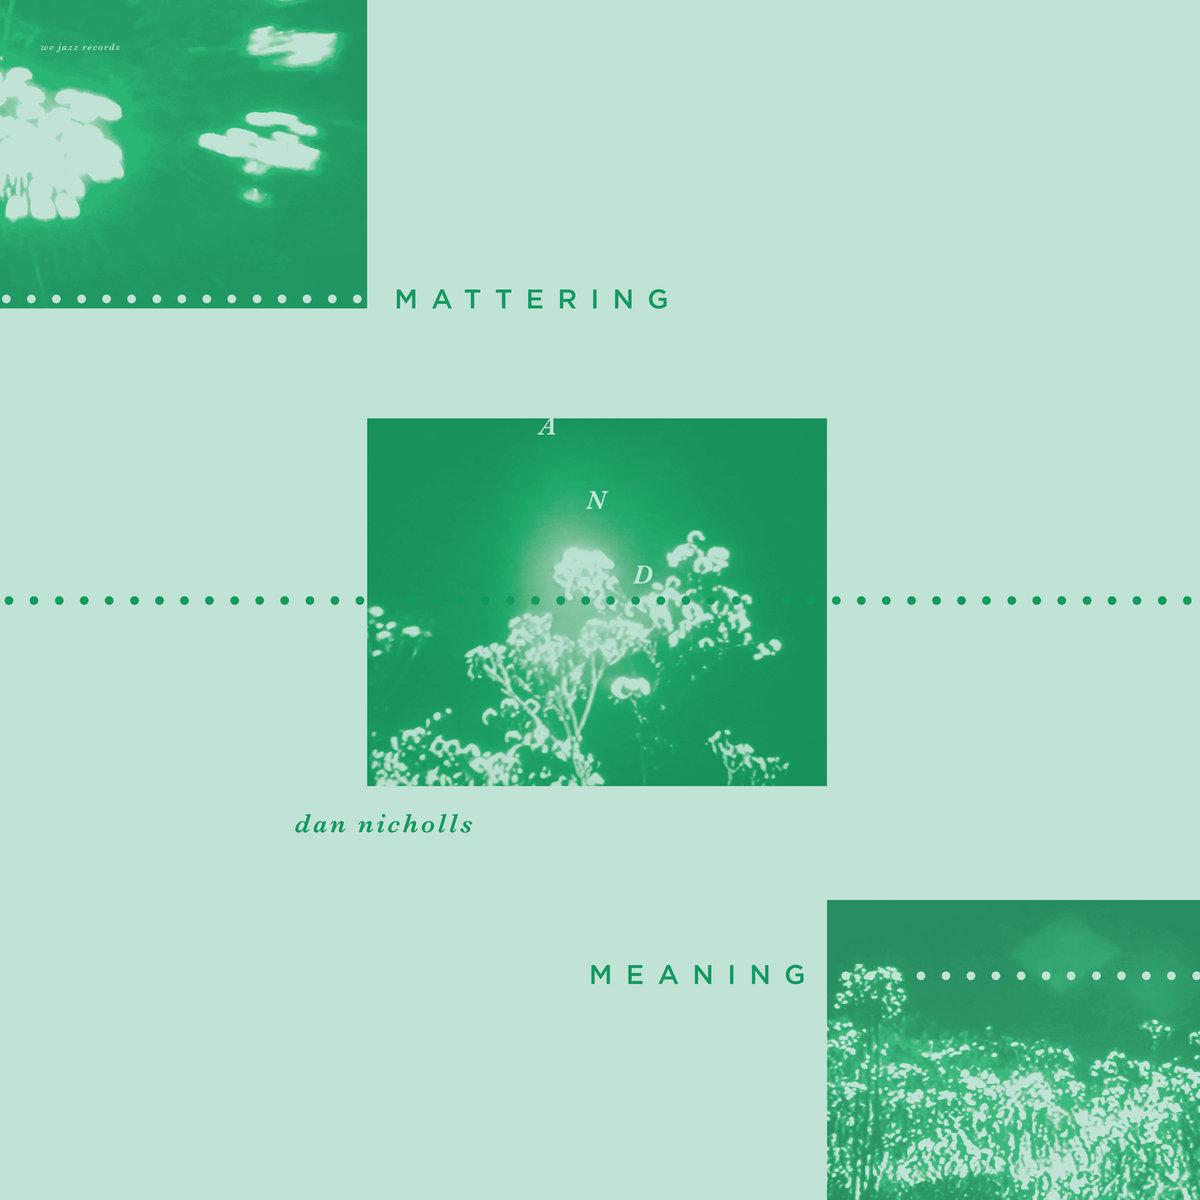 Dan Nicholls | Mattering and Meaning